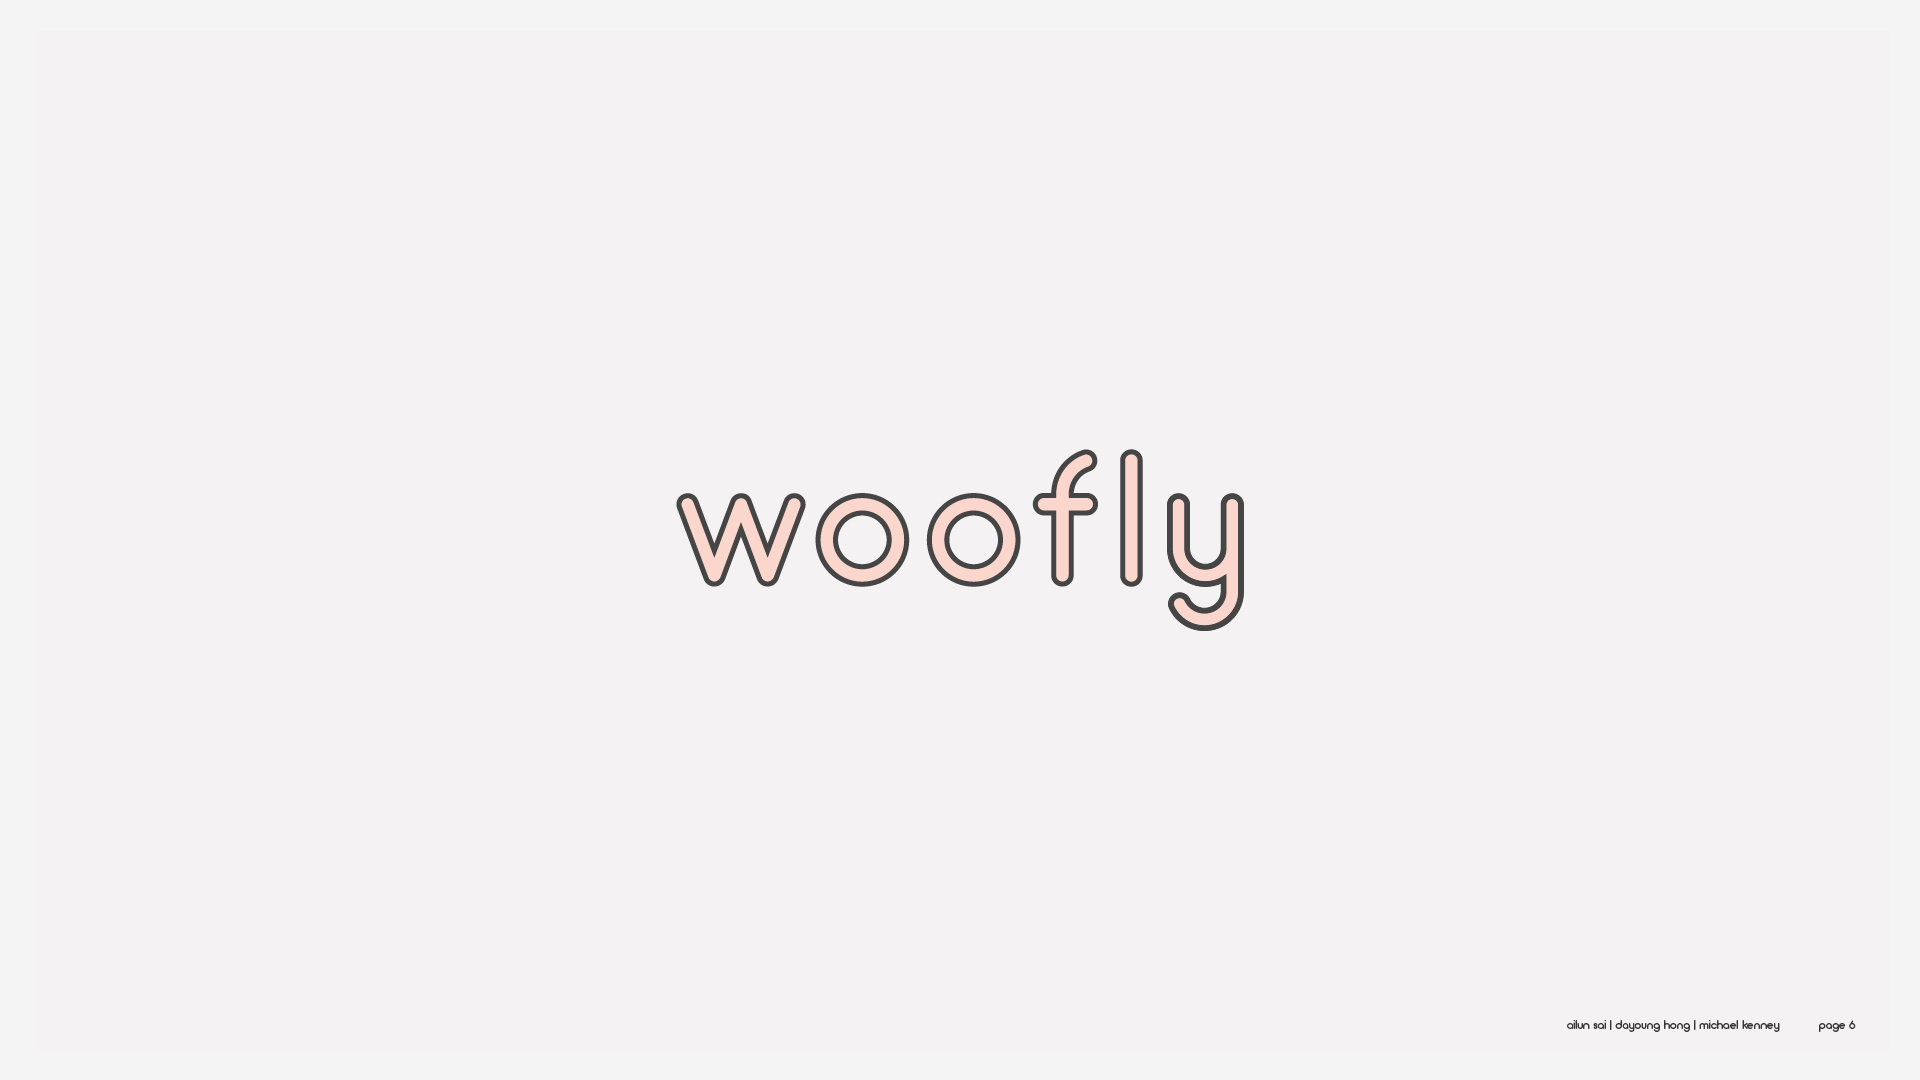 woofly-presentation6.jpg